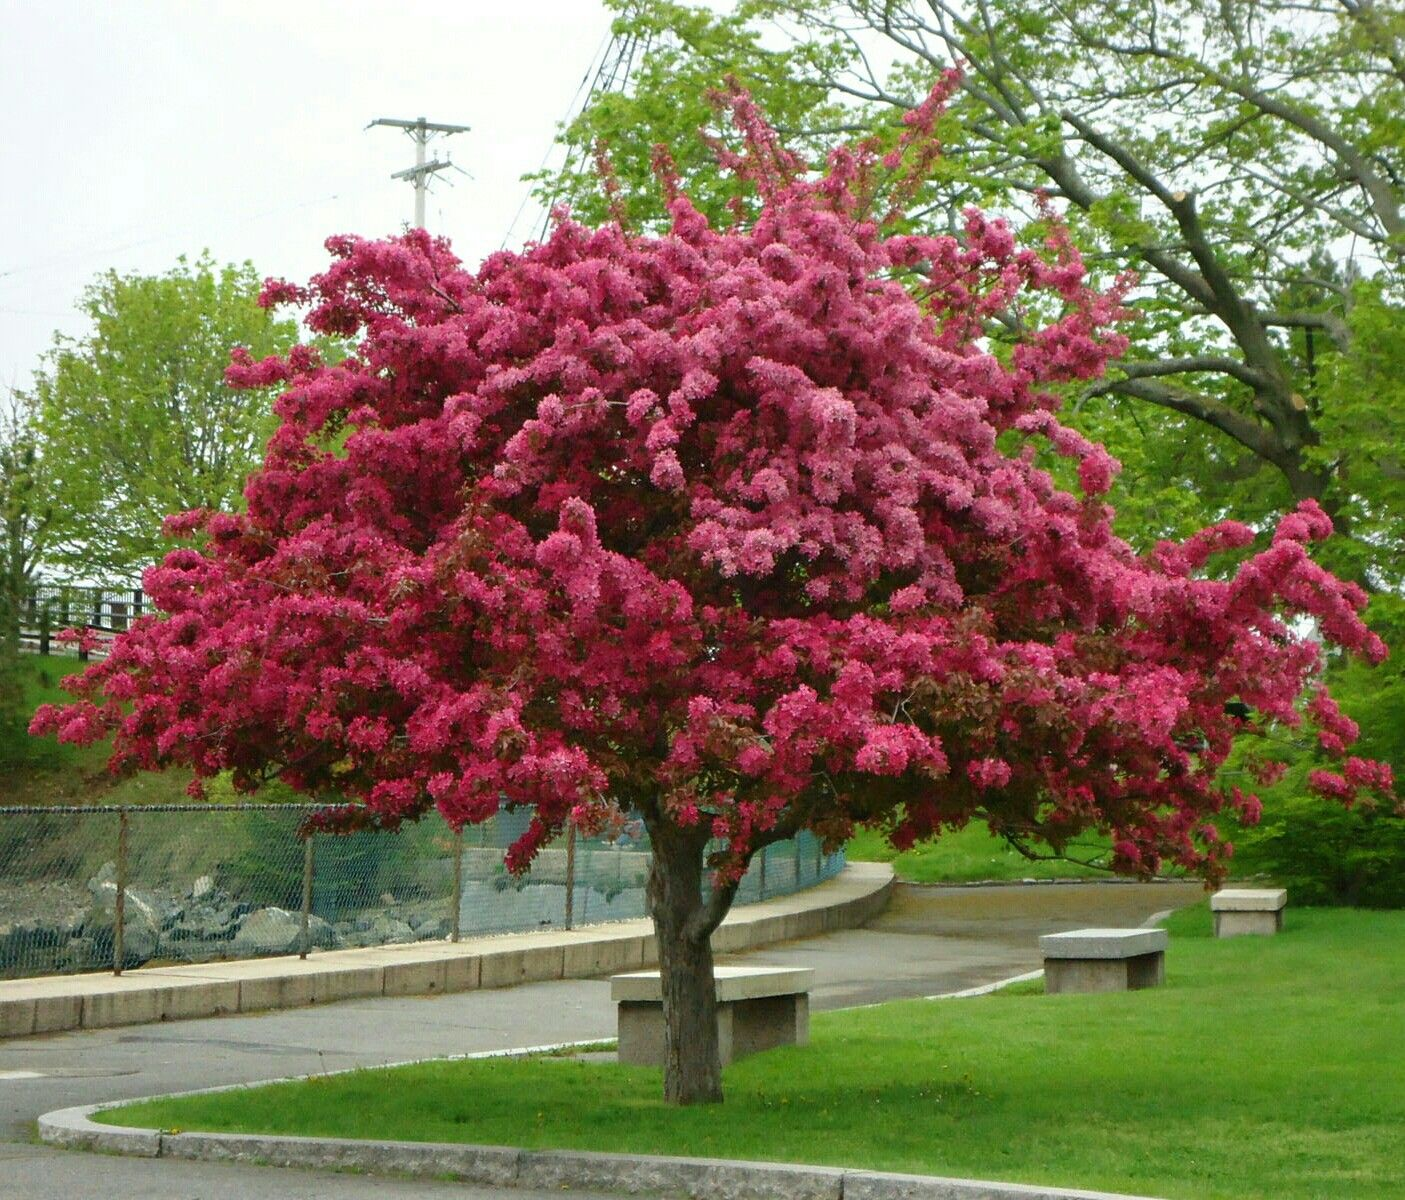 Alberi Nani Da Giardino pin di clara camatel su gardening | alberi in fiore